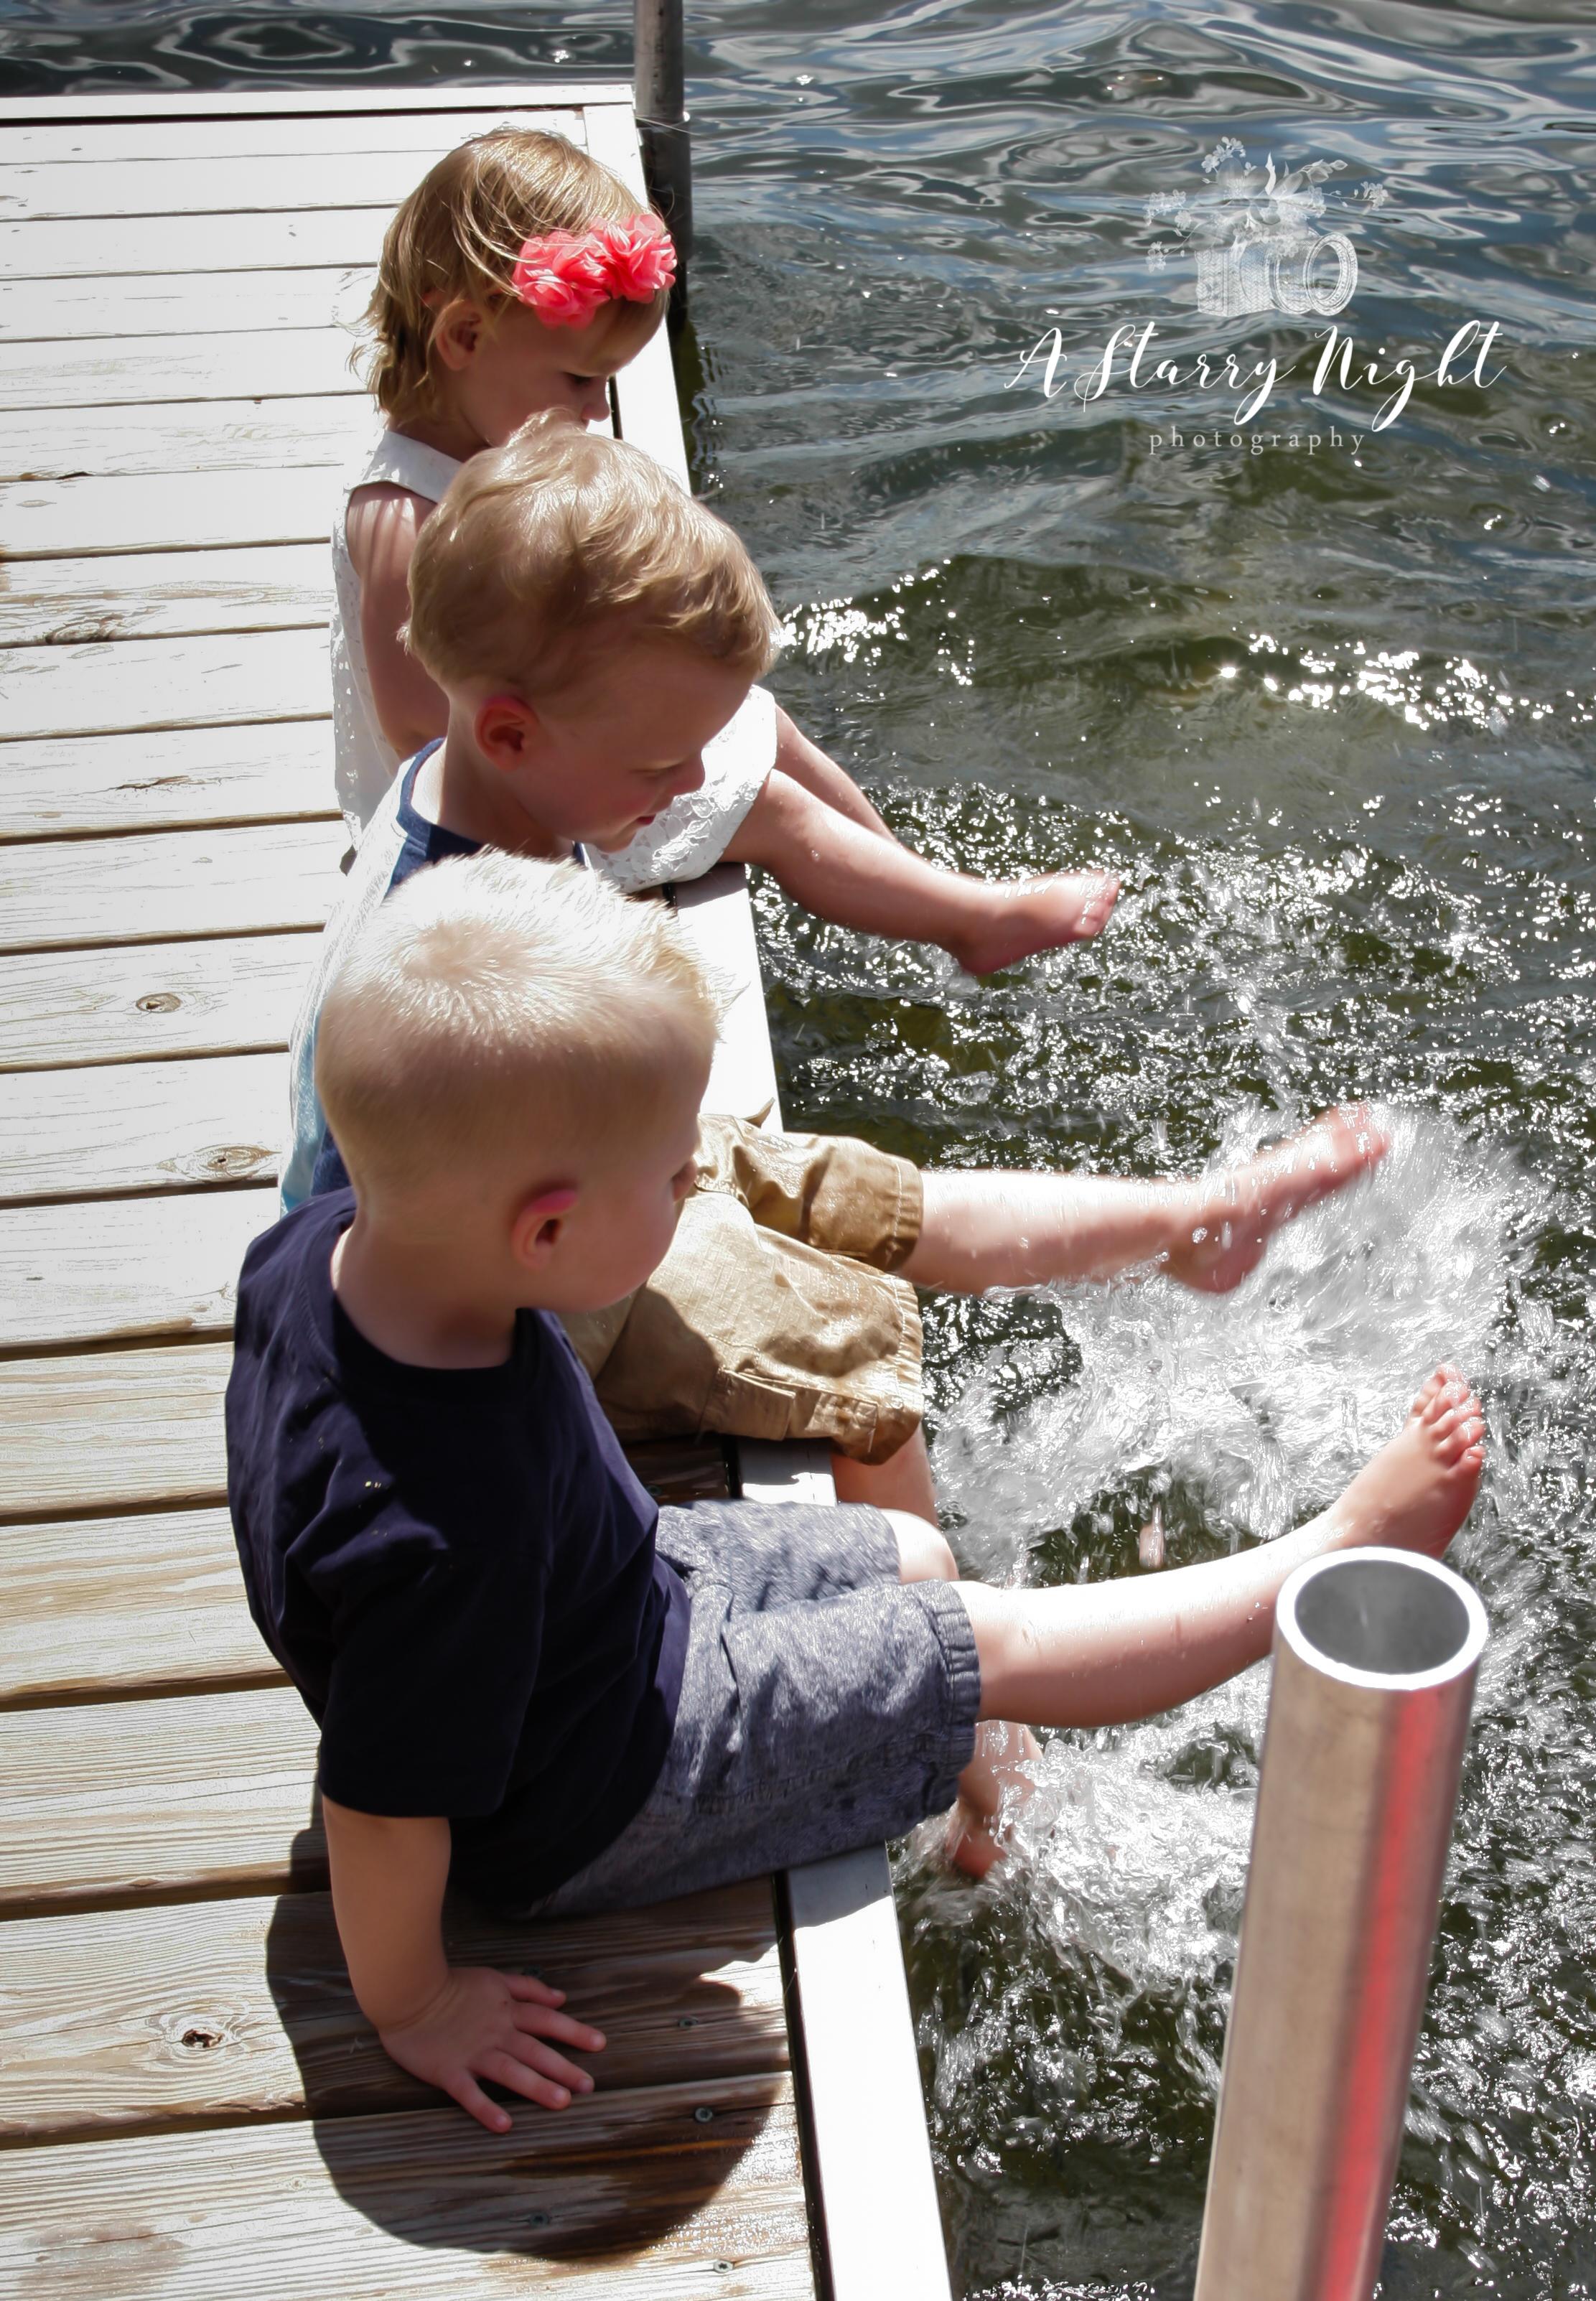 Thietten-Family-Lifestyle-Session-Farwell-Lake-13-26.jpg